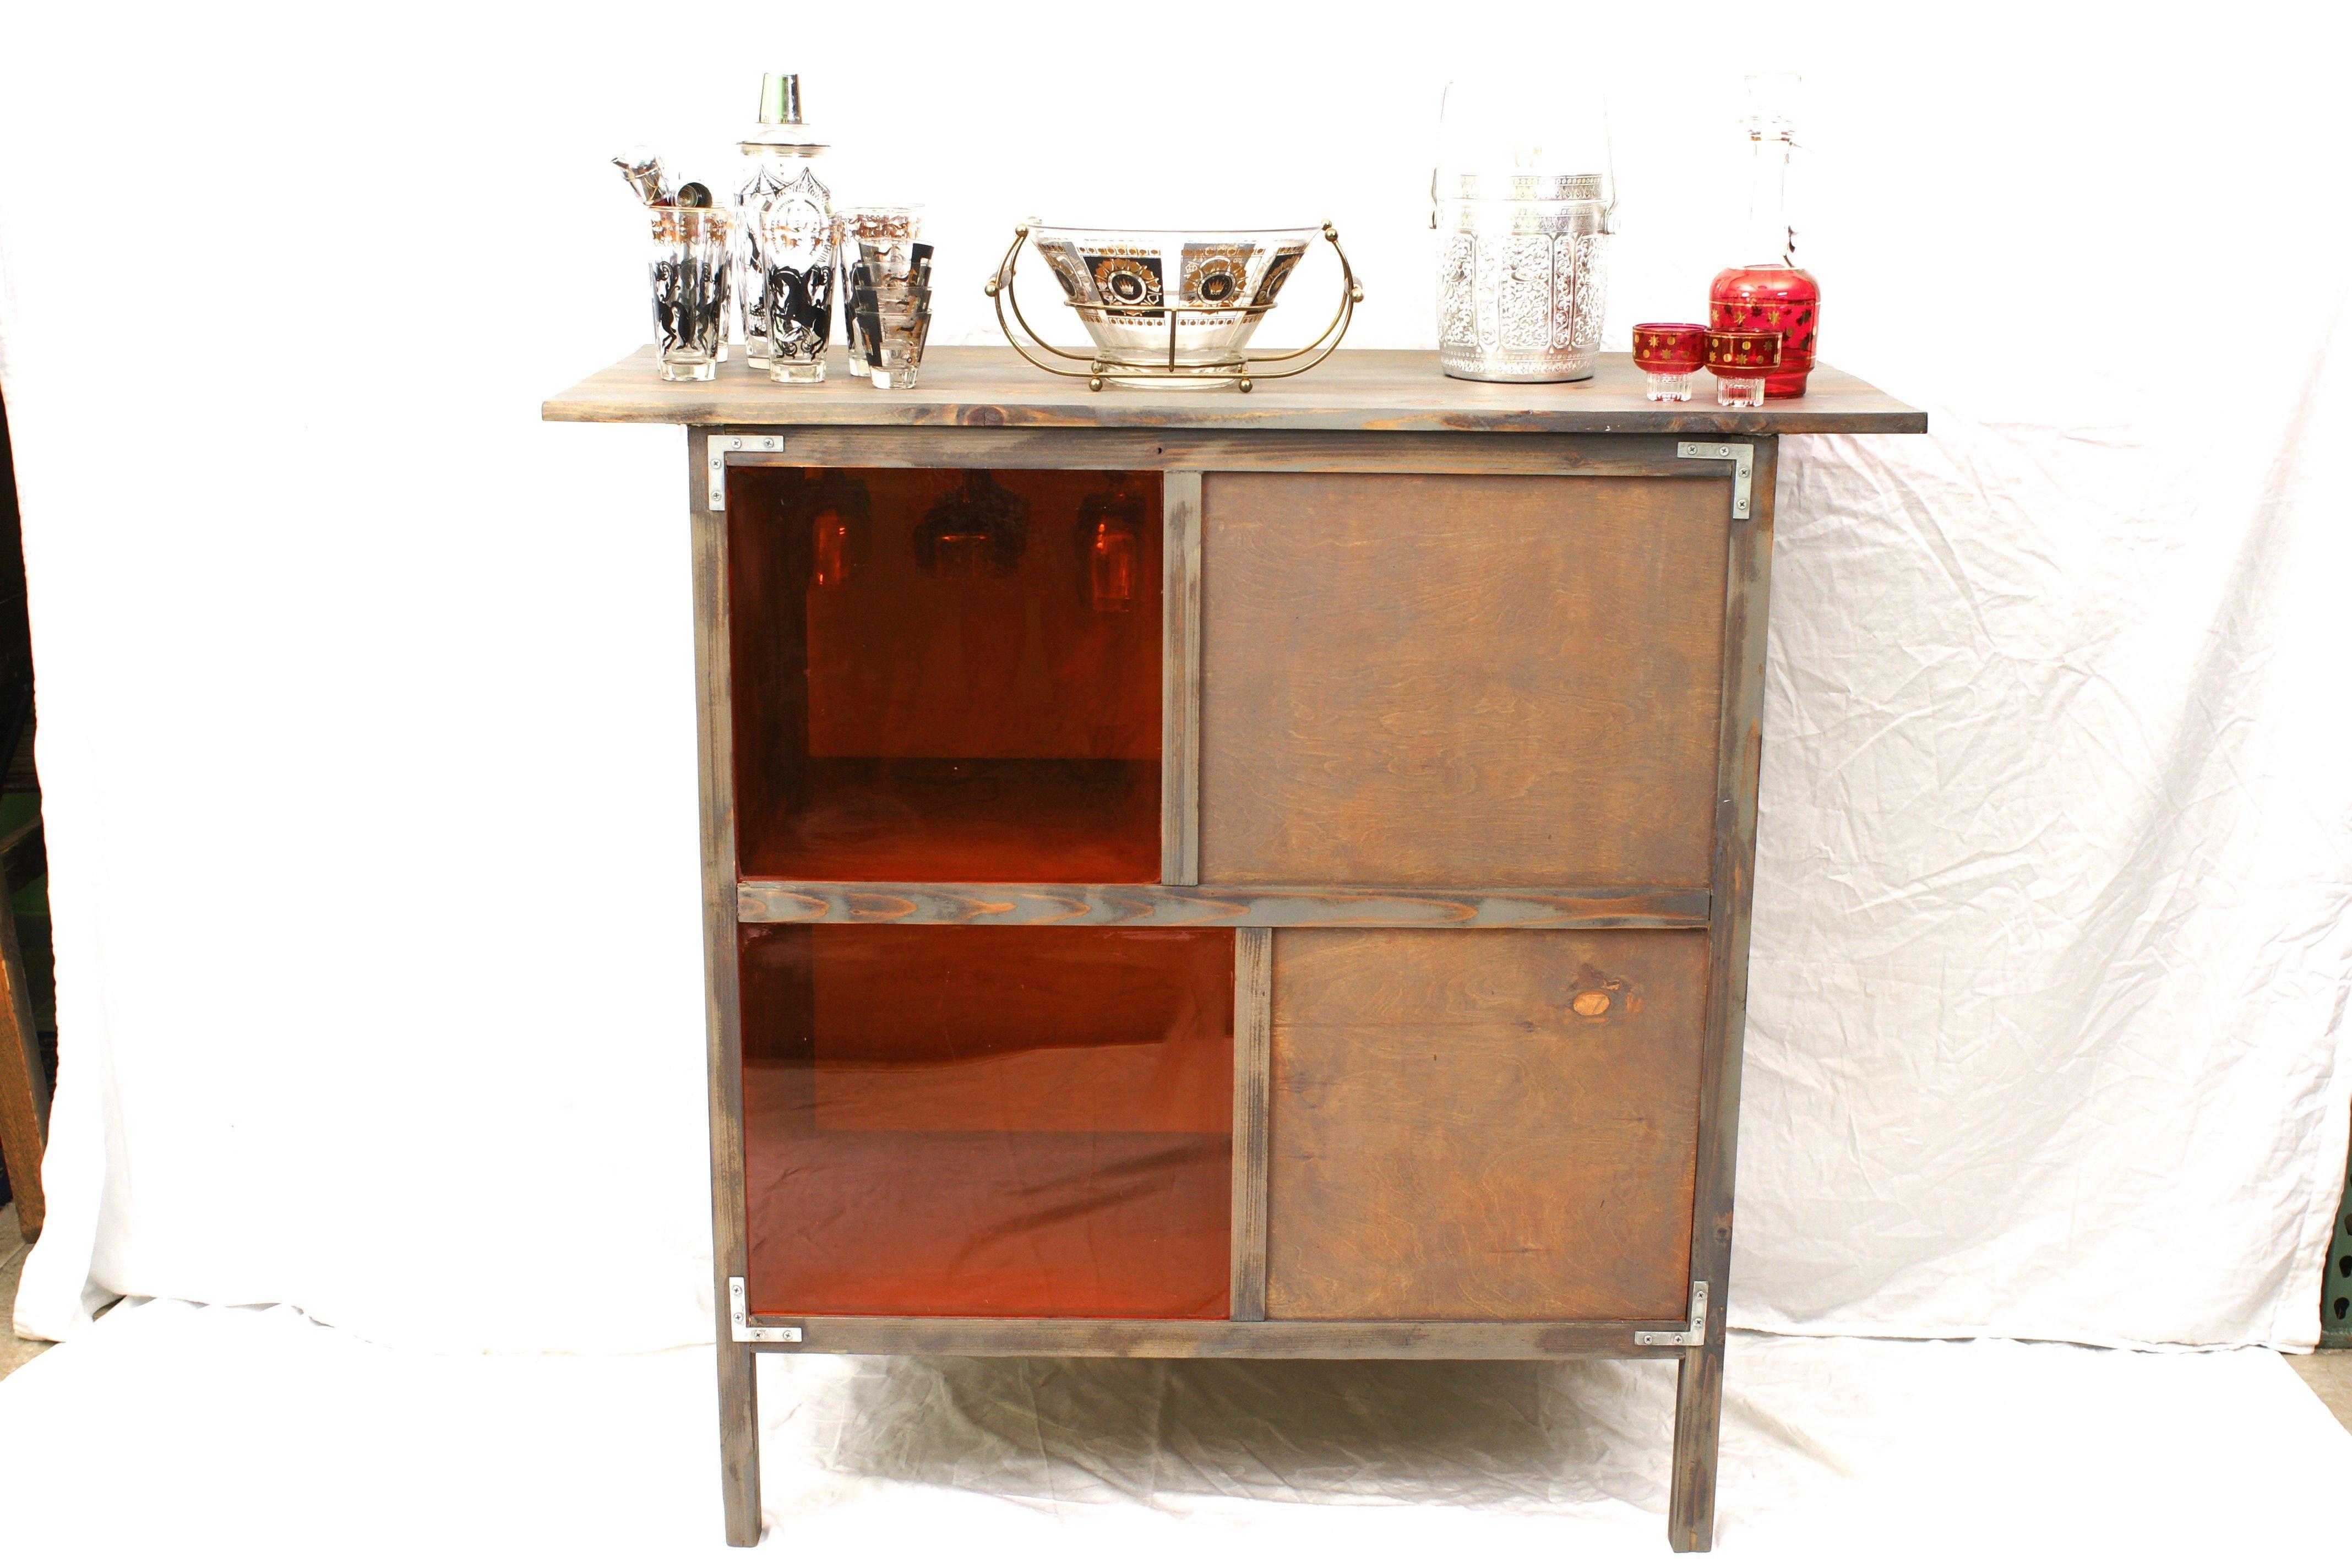 20% OFF -Mid Century Rustic Industrial Bohemian Bar